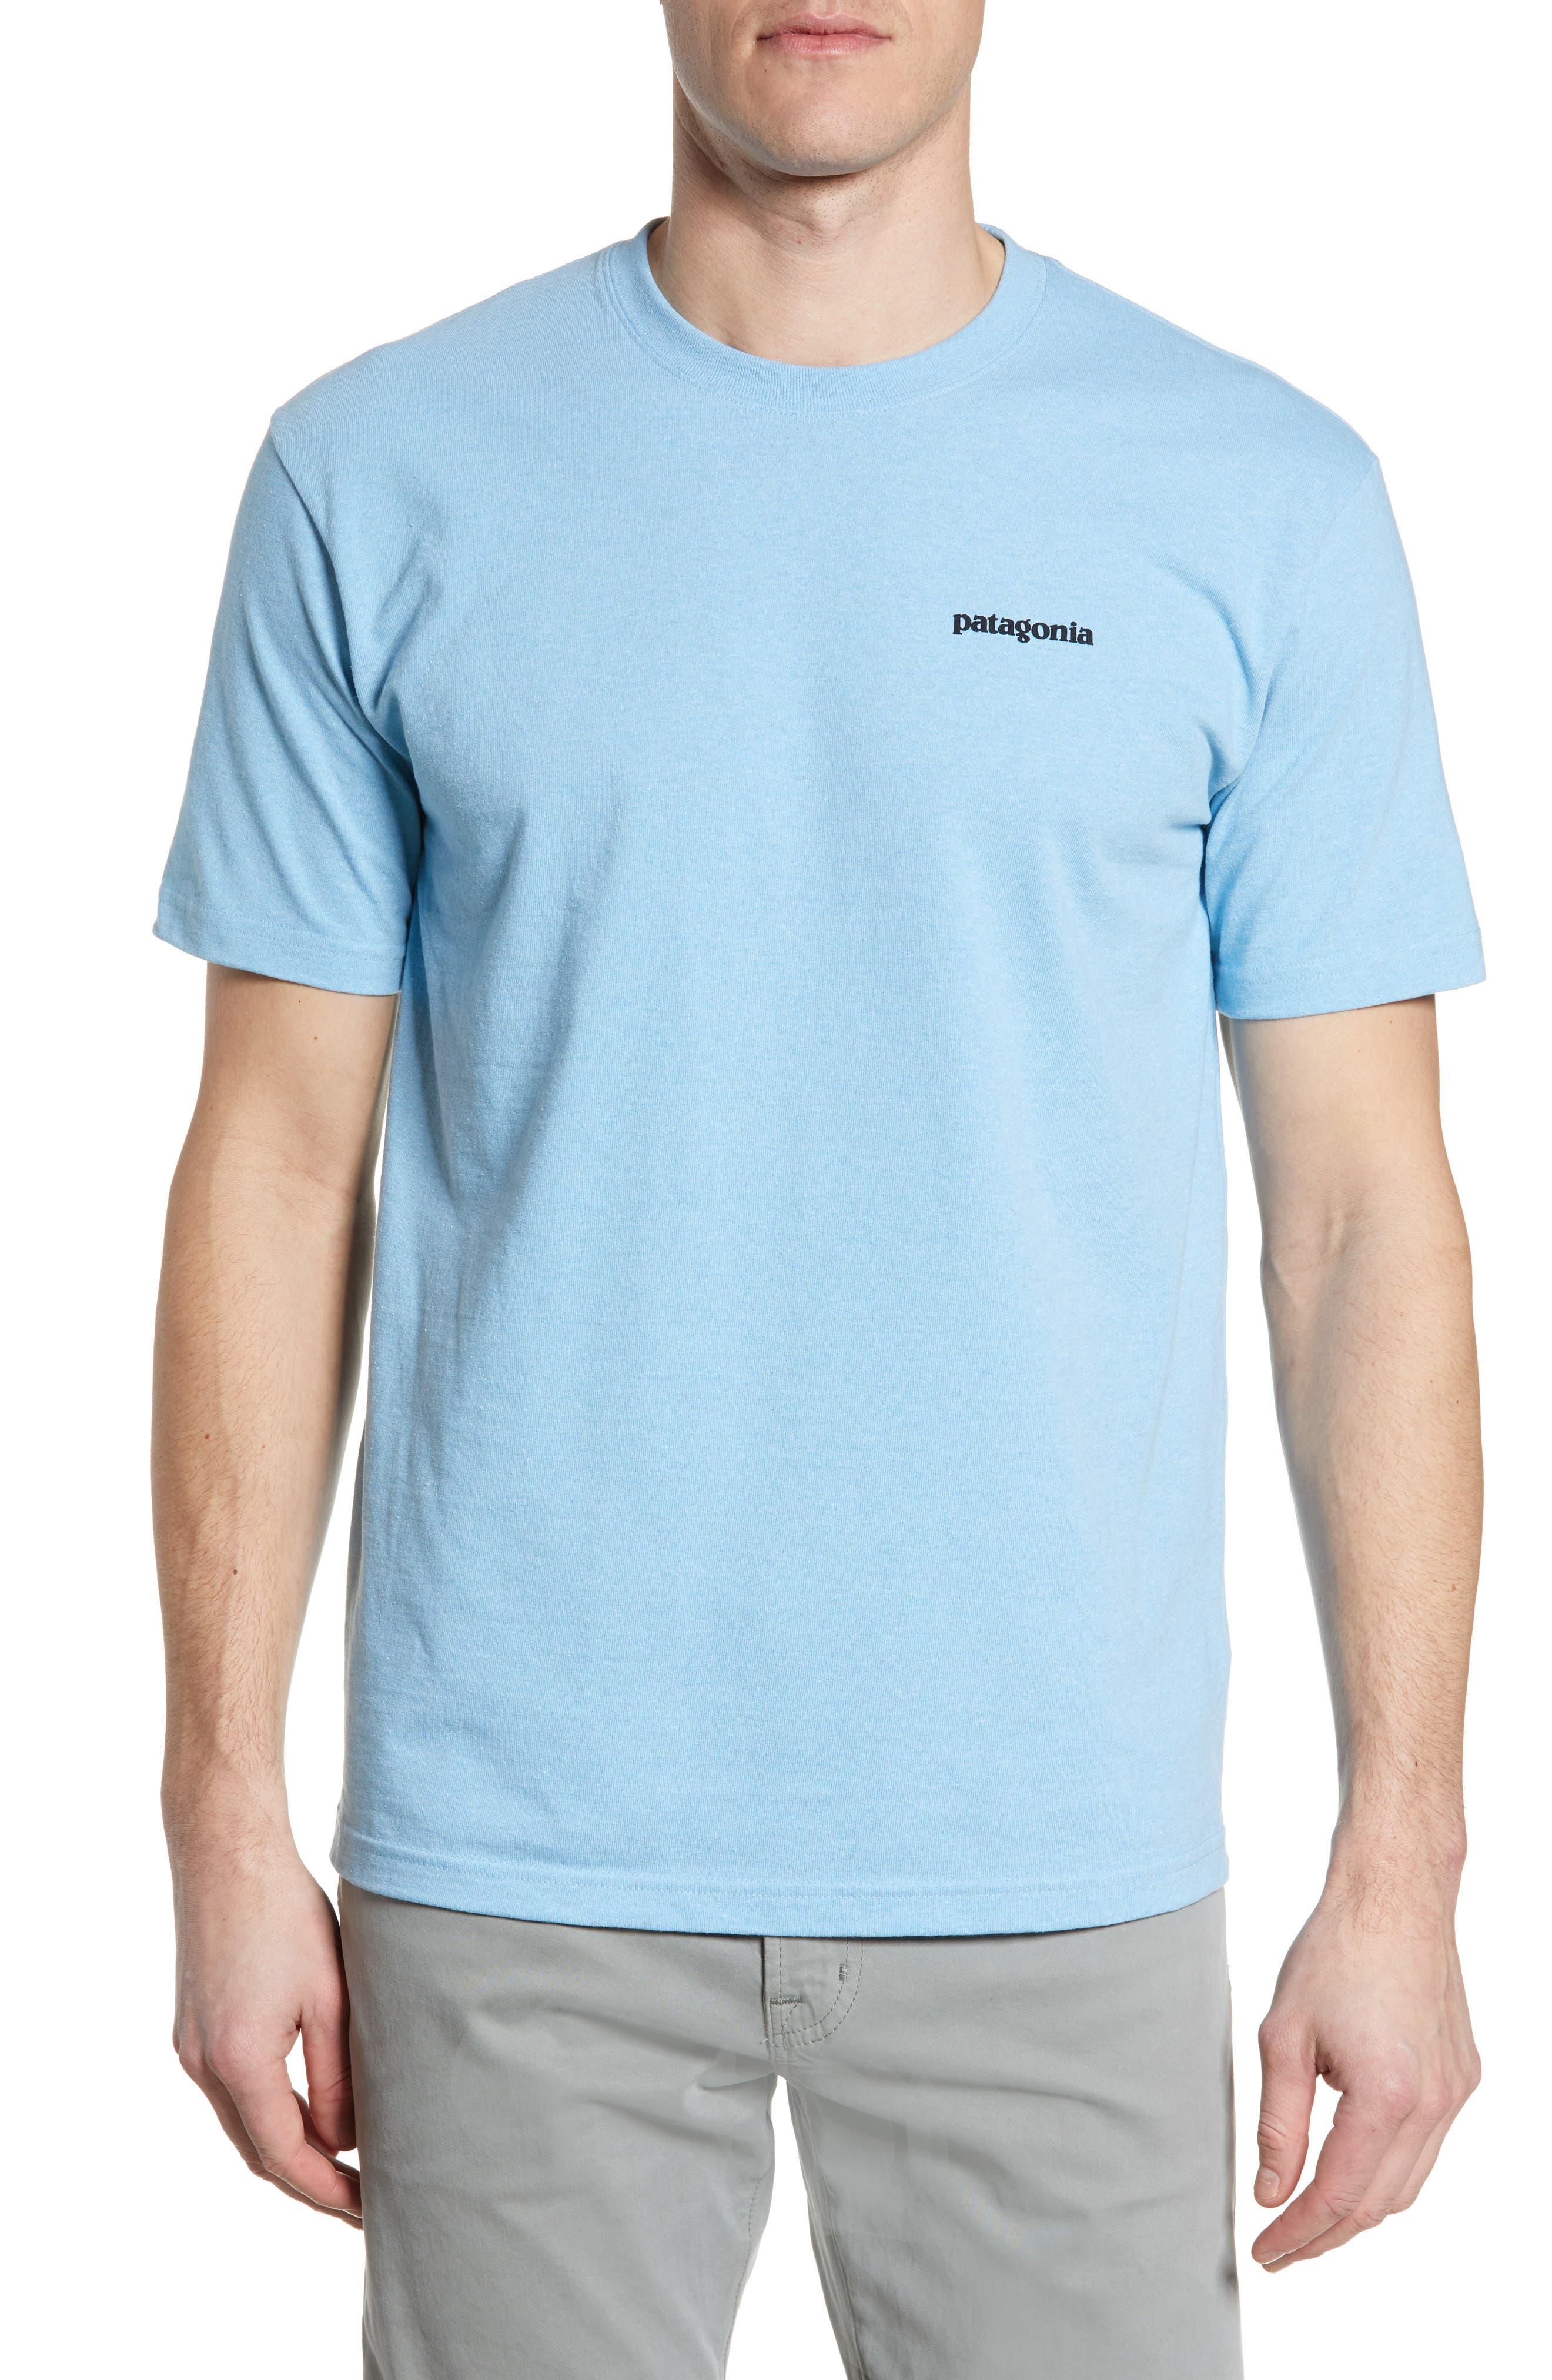 Fitz Roy Tarpon Responsibili-Tee T-Shirt, Main, color, BREAK UP BLUE